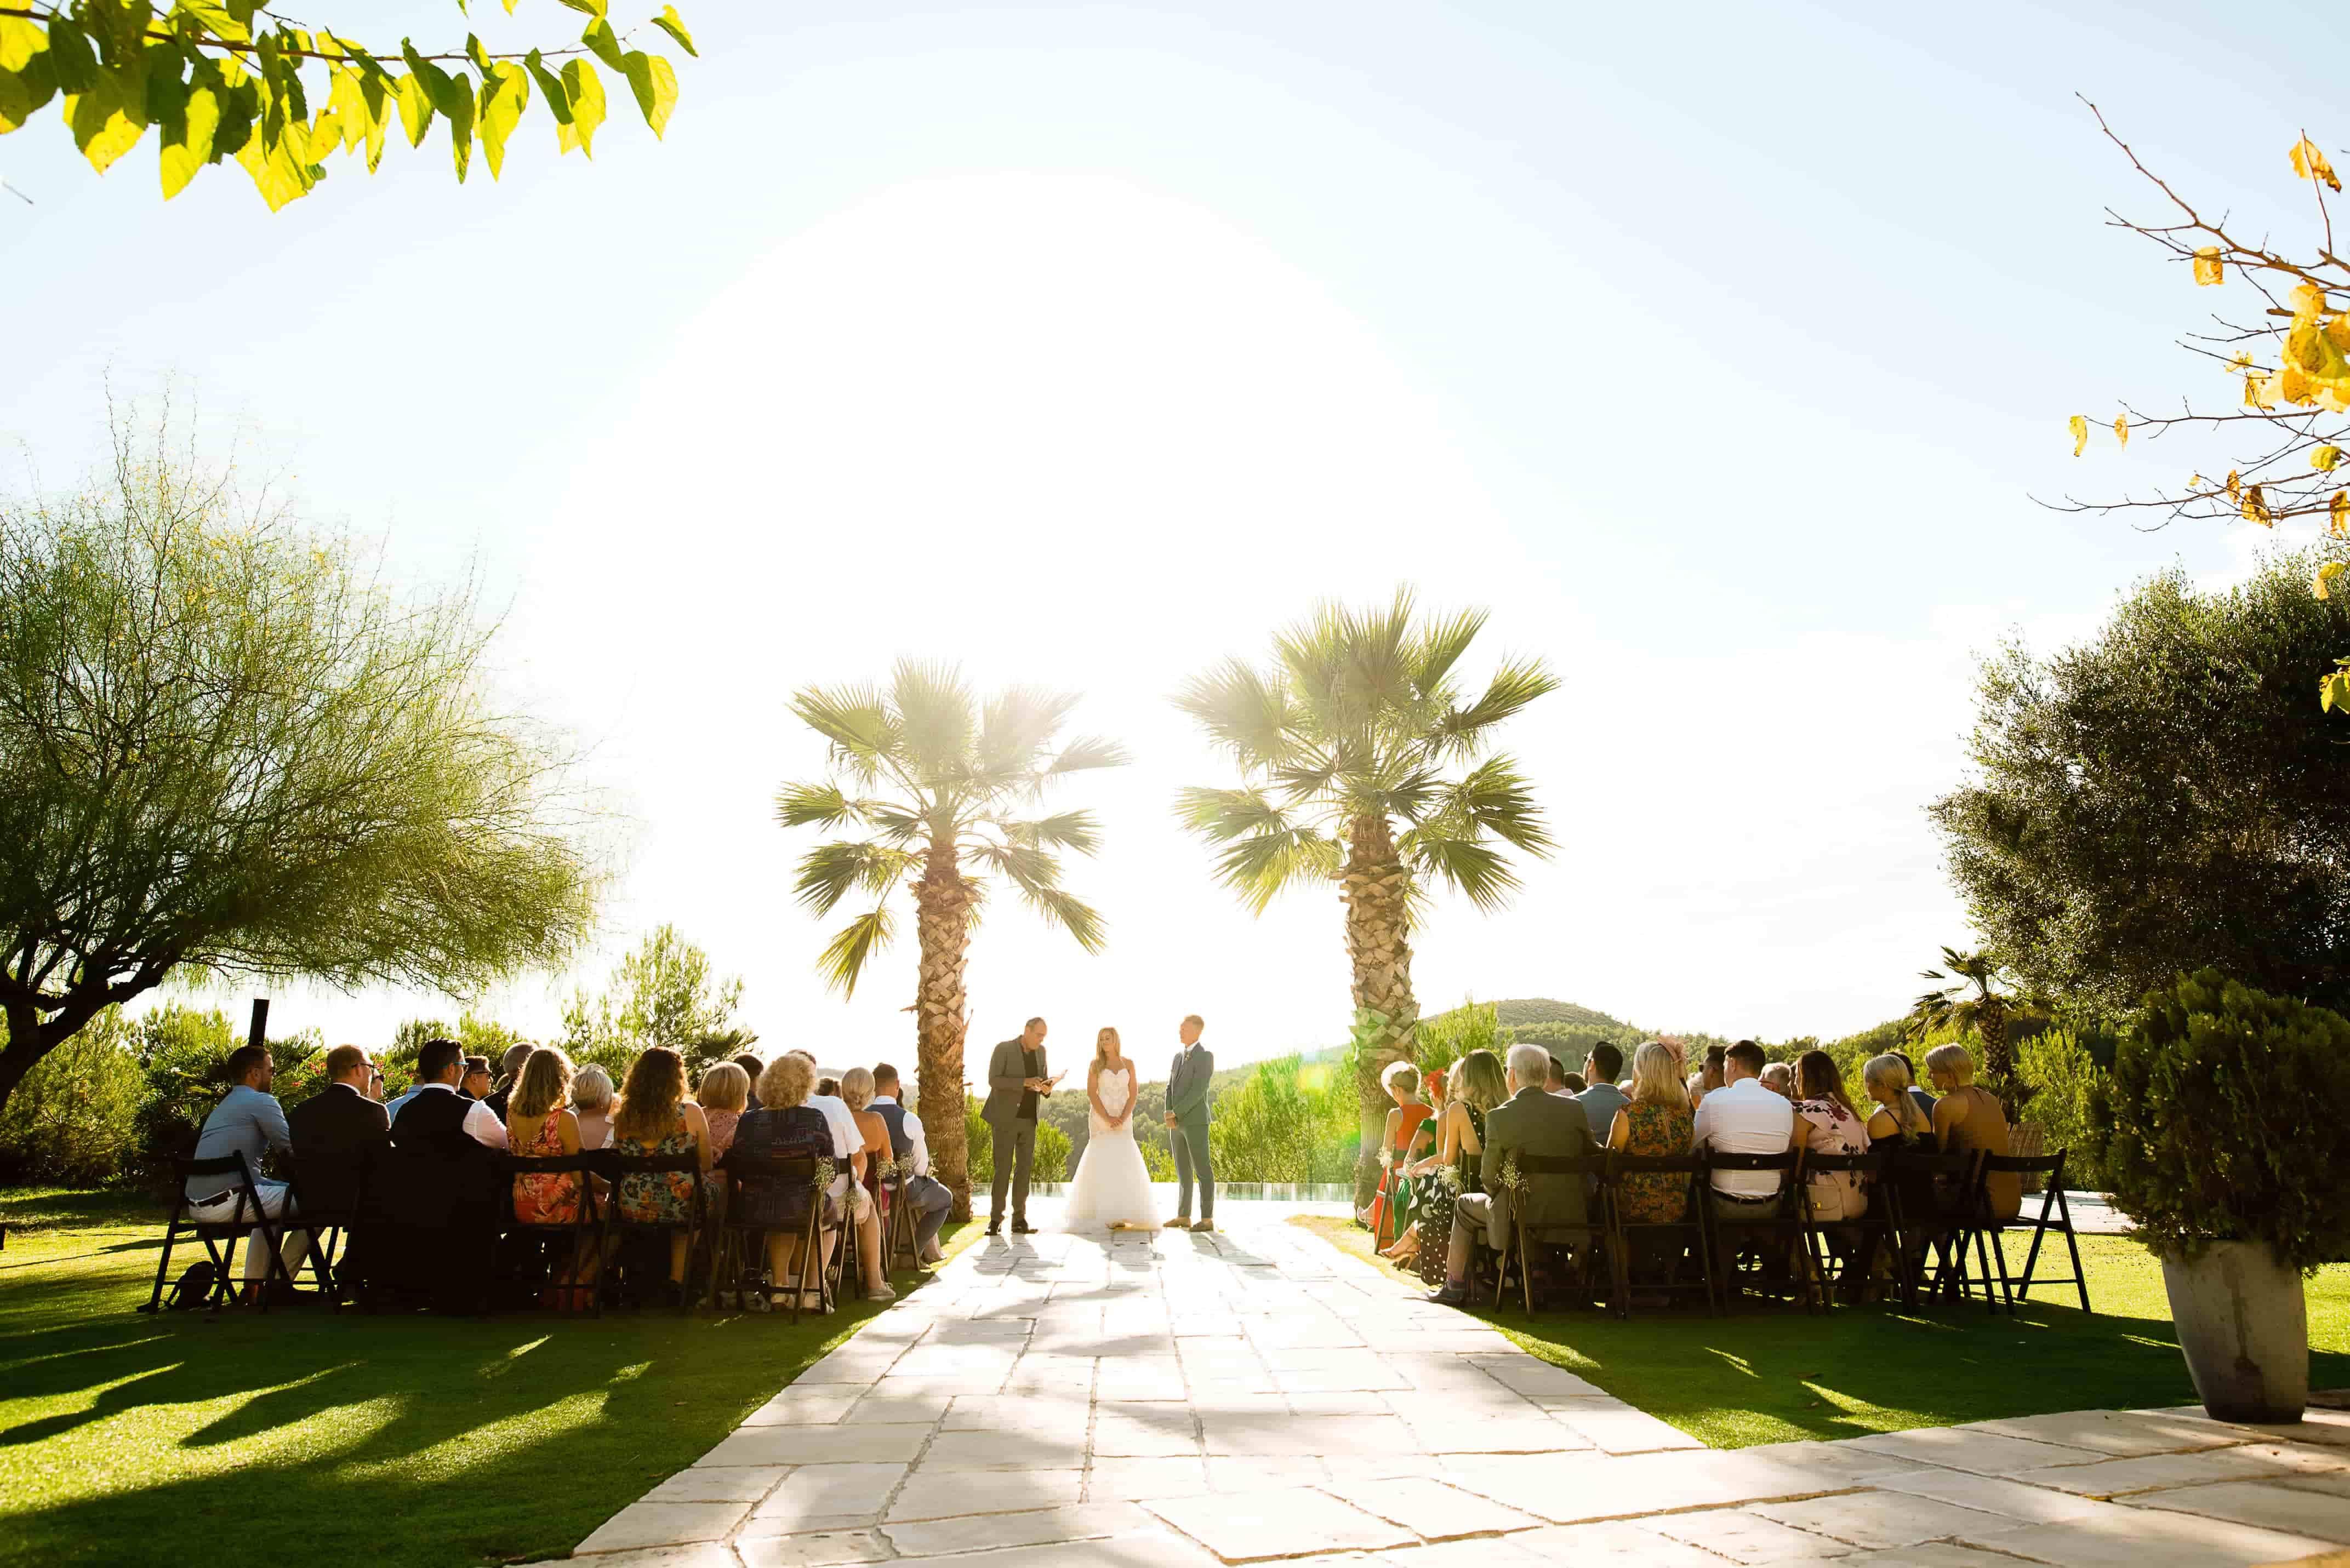 Luxury-Weddings-Barcelona-Barcelona-Wedding-Planner-22-min-1-min